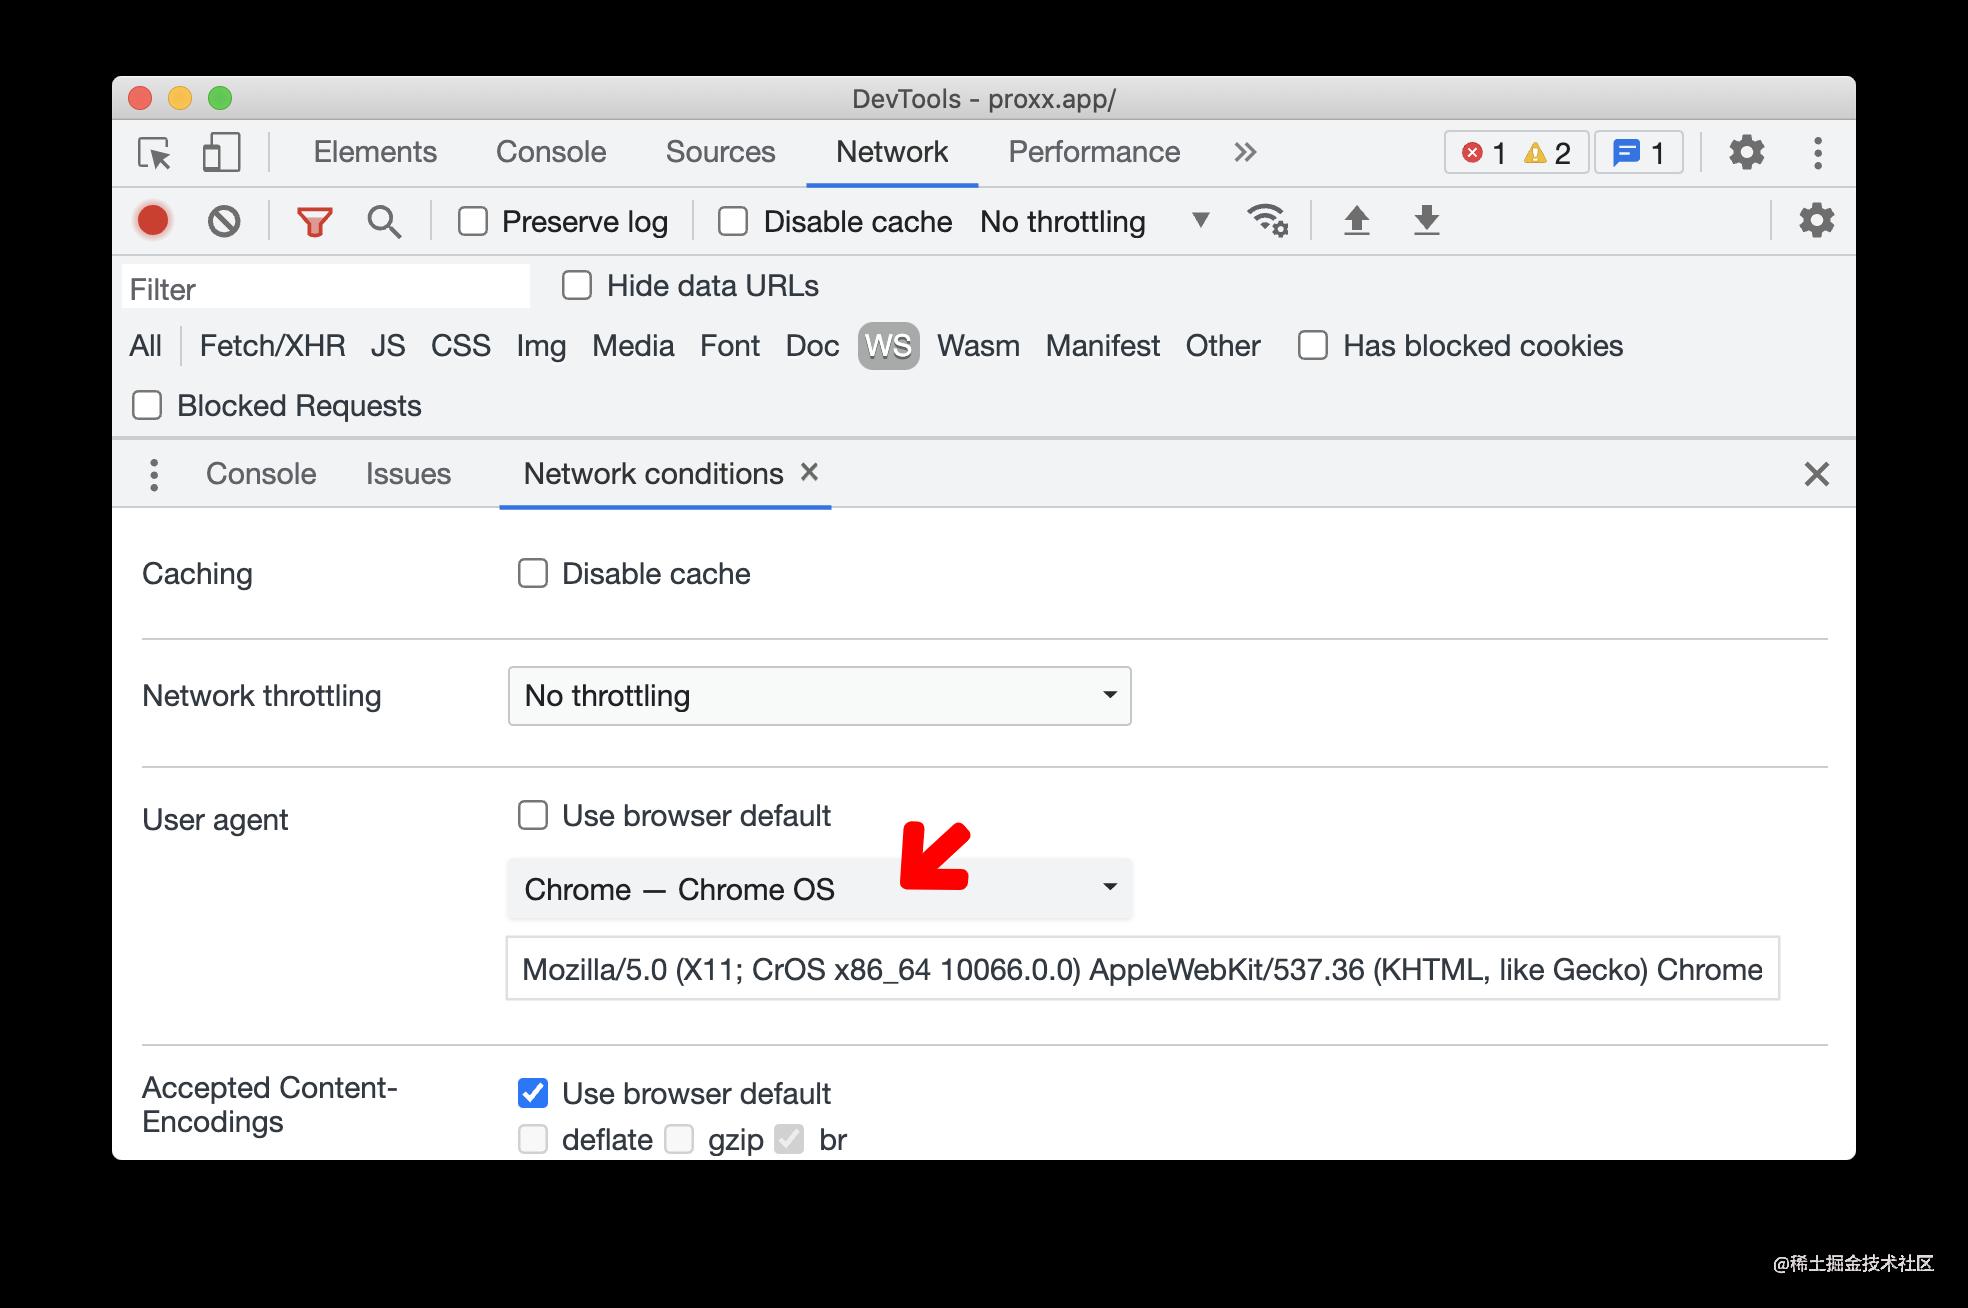 Network 状态面板新增提示用户代理端设备选项